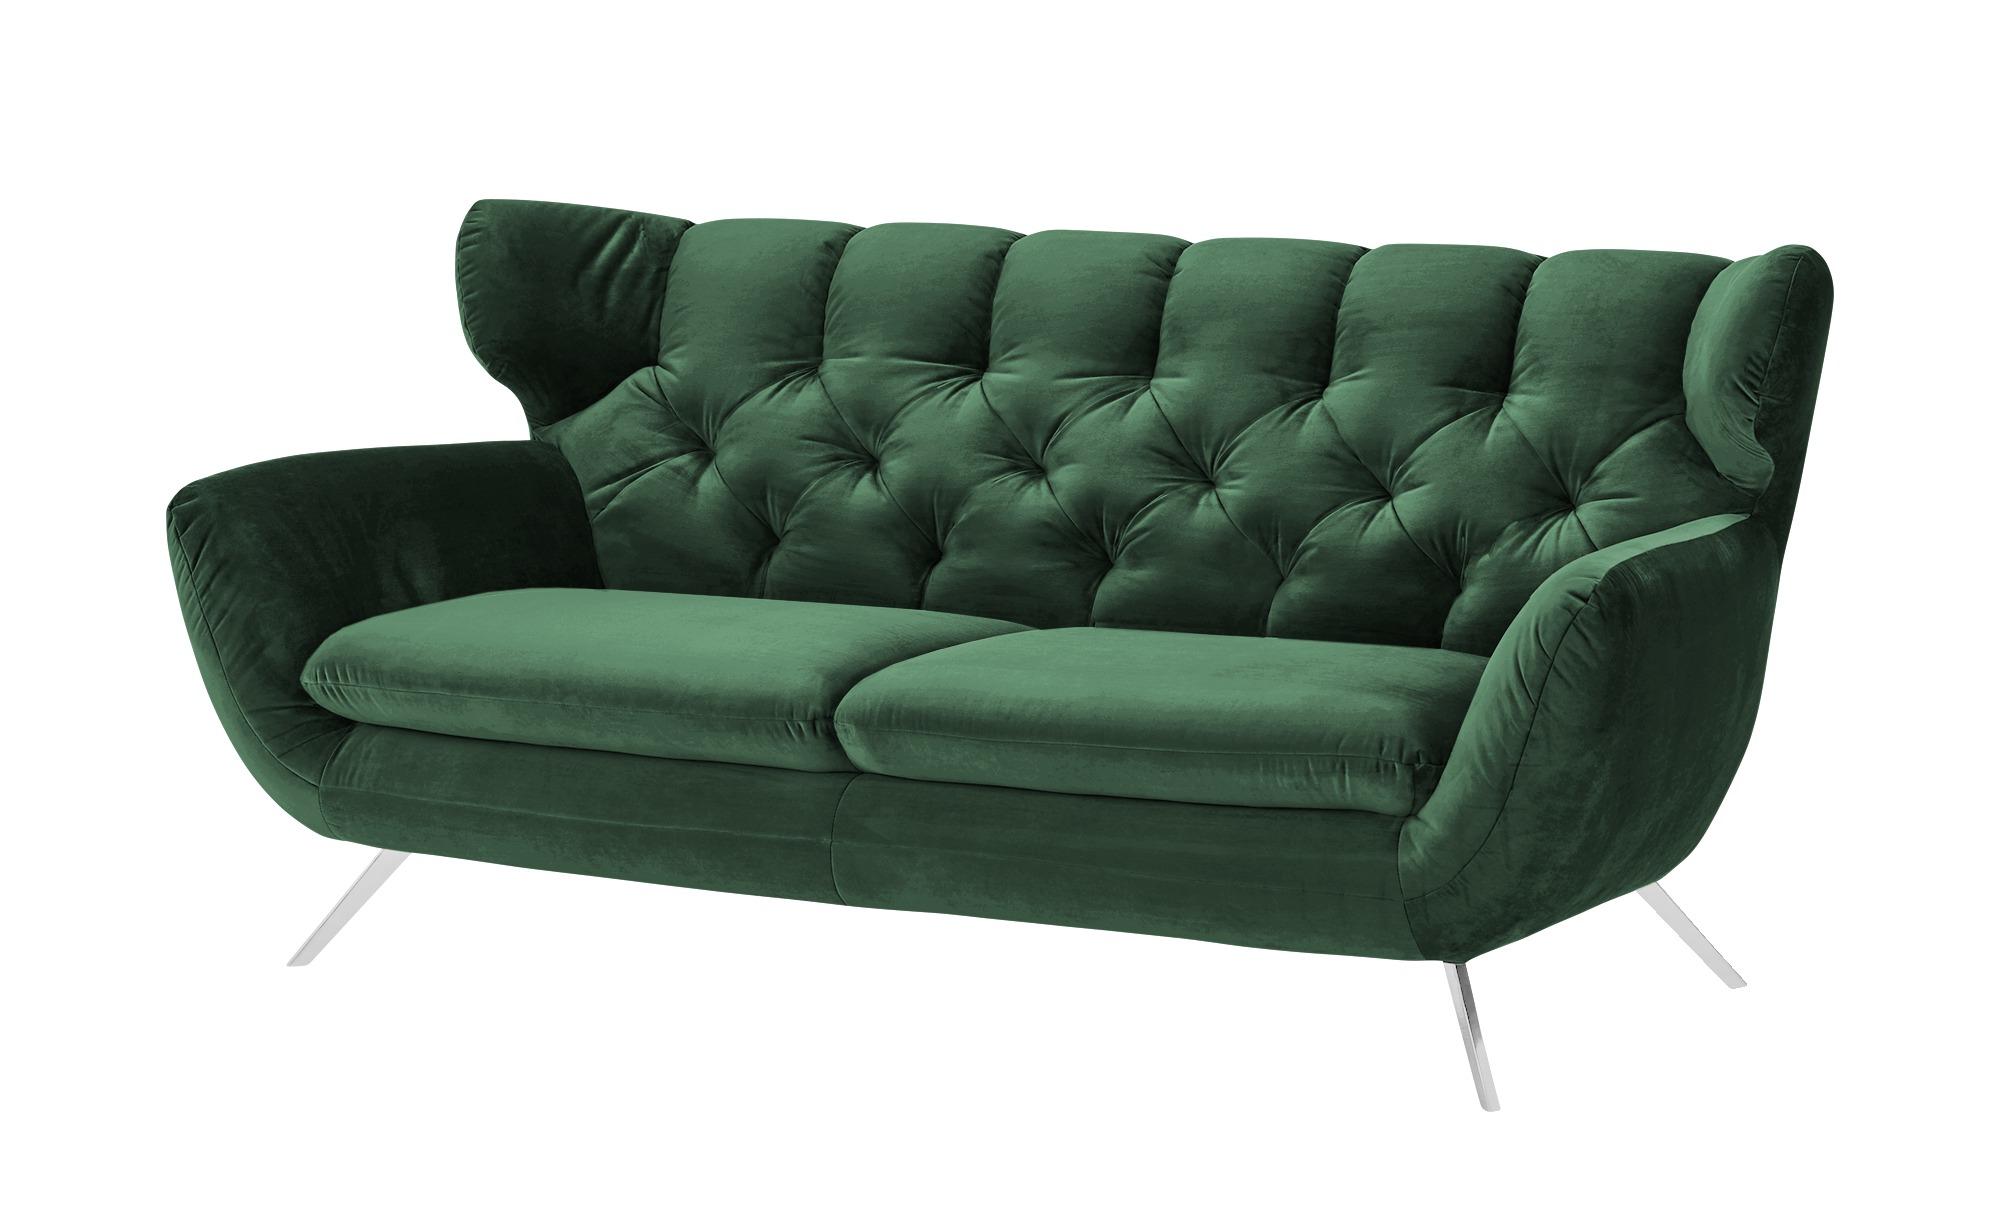 Sofa  Caldara ¦ grün ¦ Maße (cm): B: 200 H: 94 T: 95 Polstermöbel > Sofas > Einzelsofas - Höffner